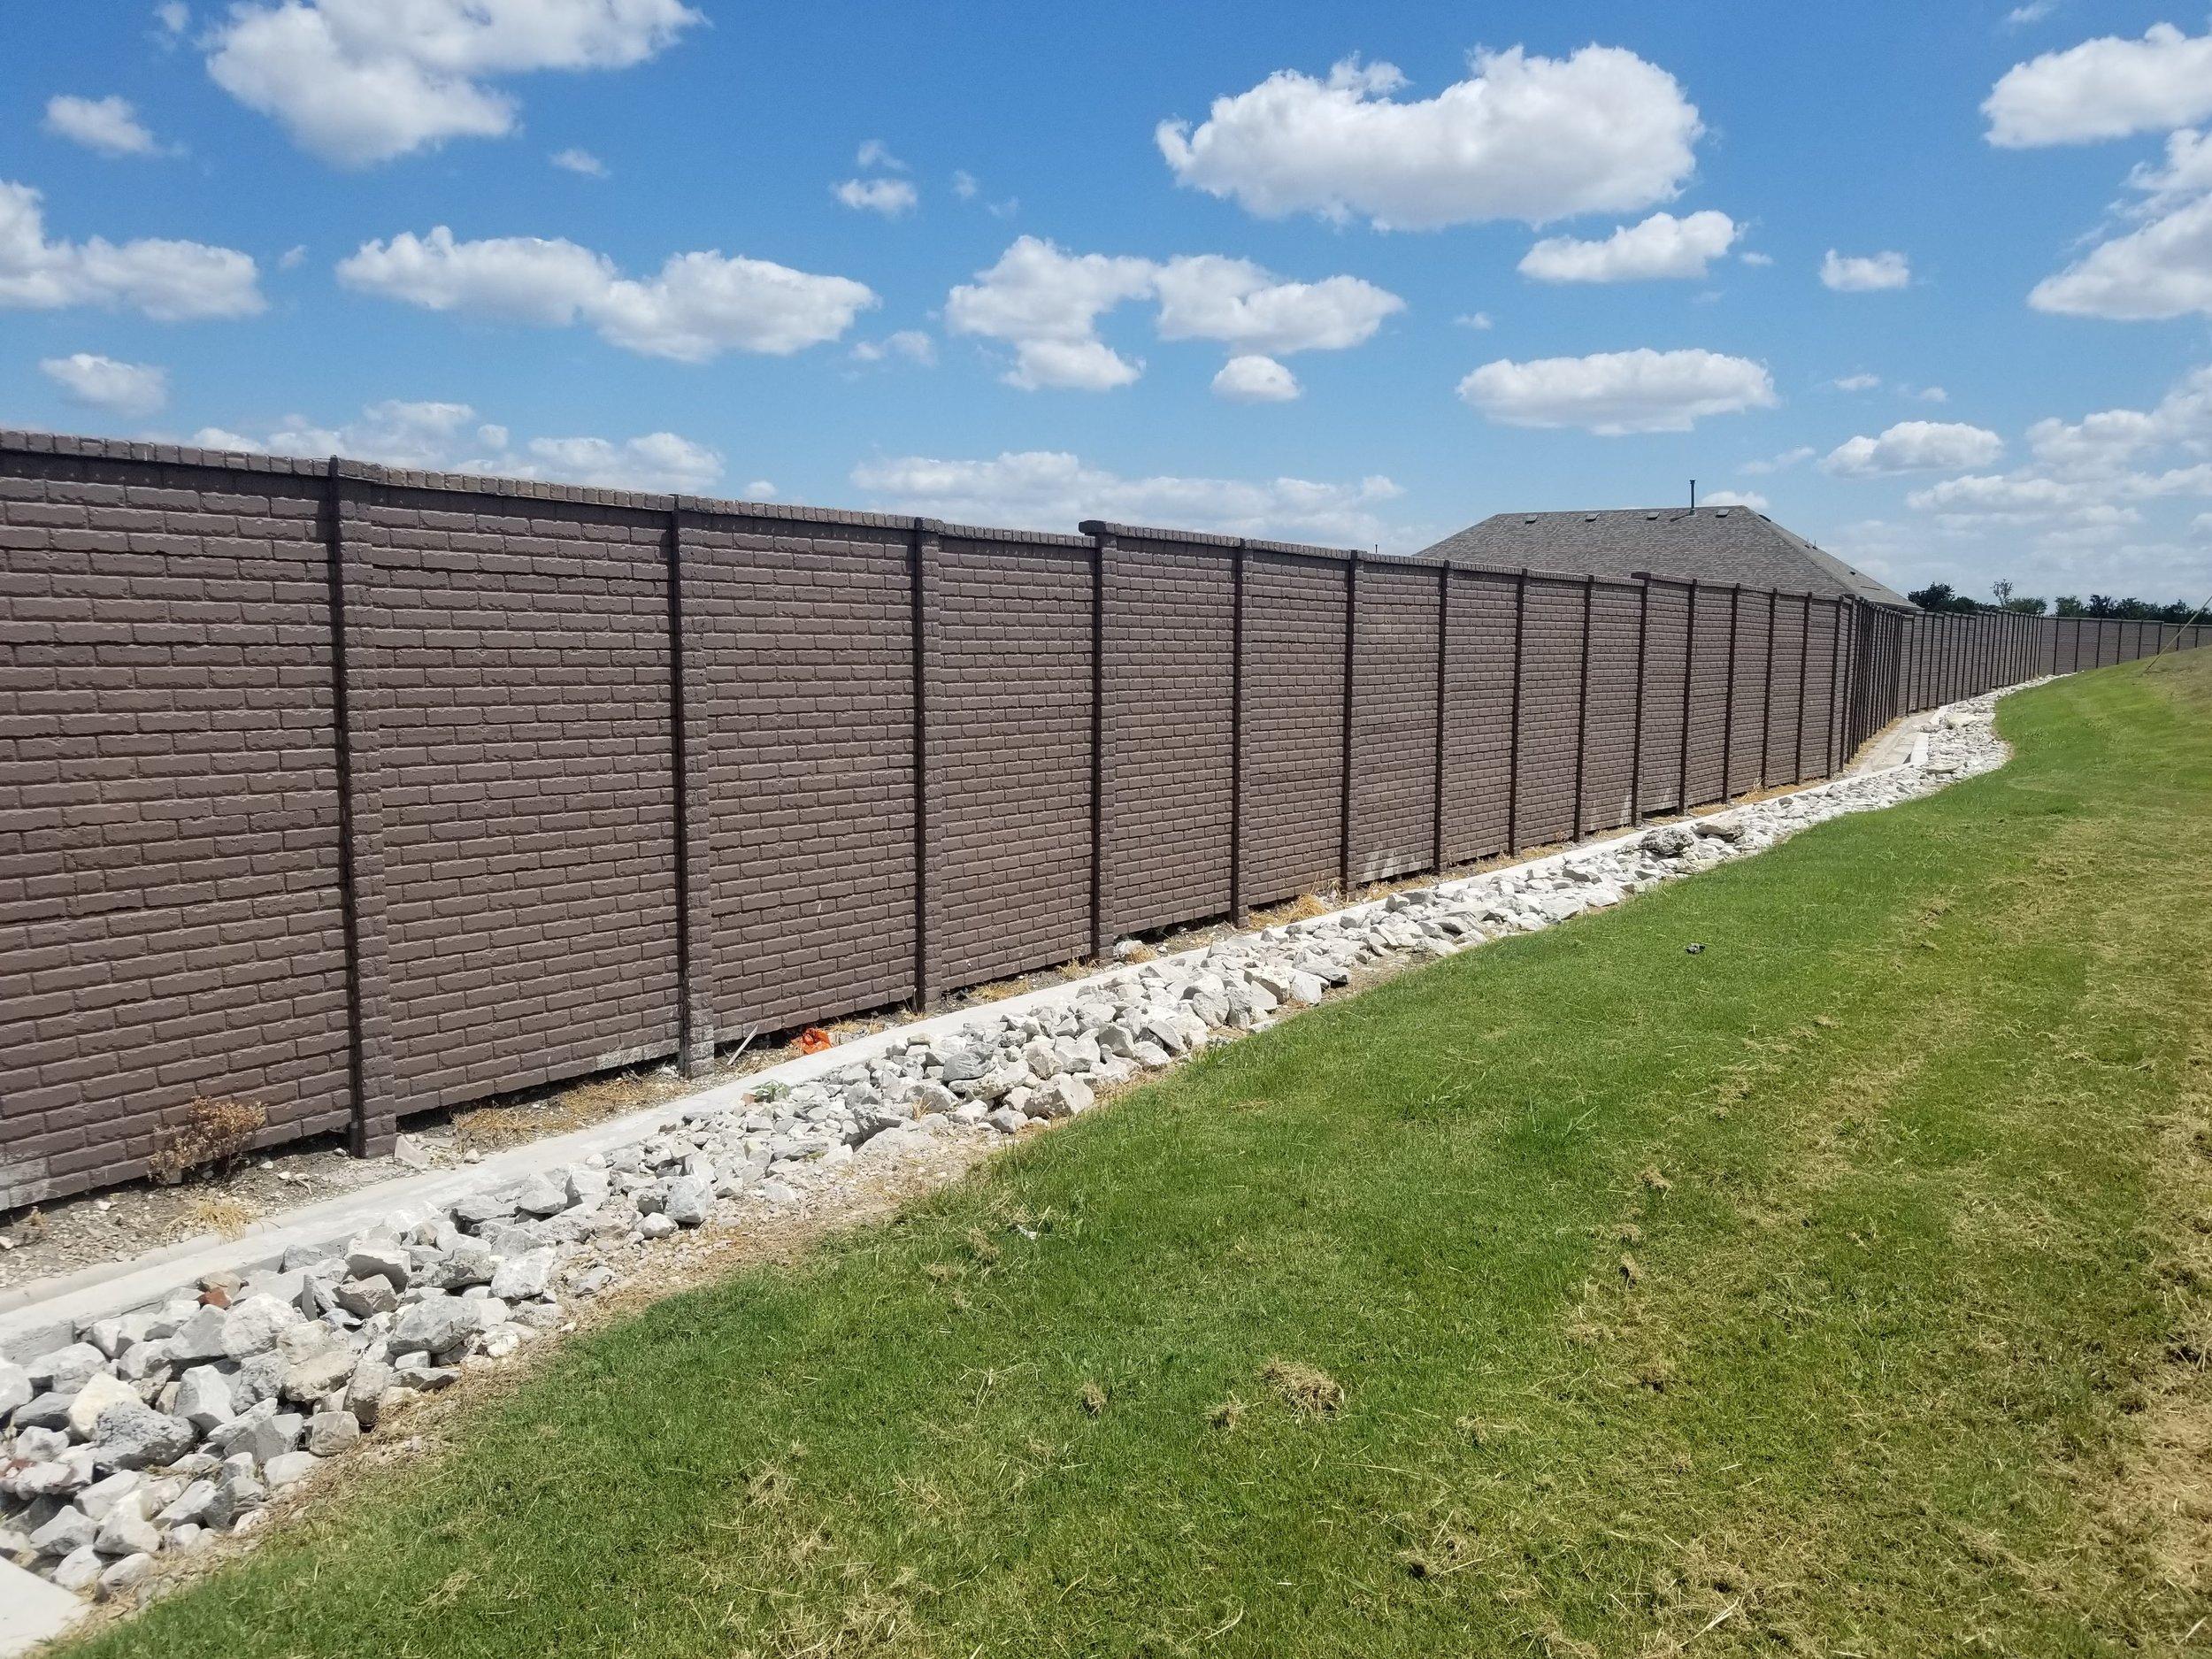 OldBrick Concrete Fence Allen, TX.jpg